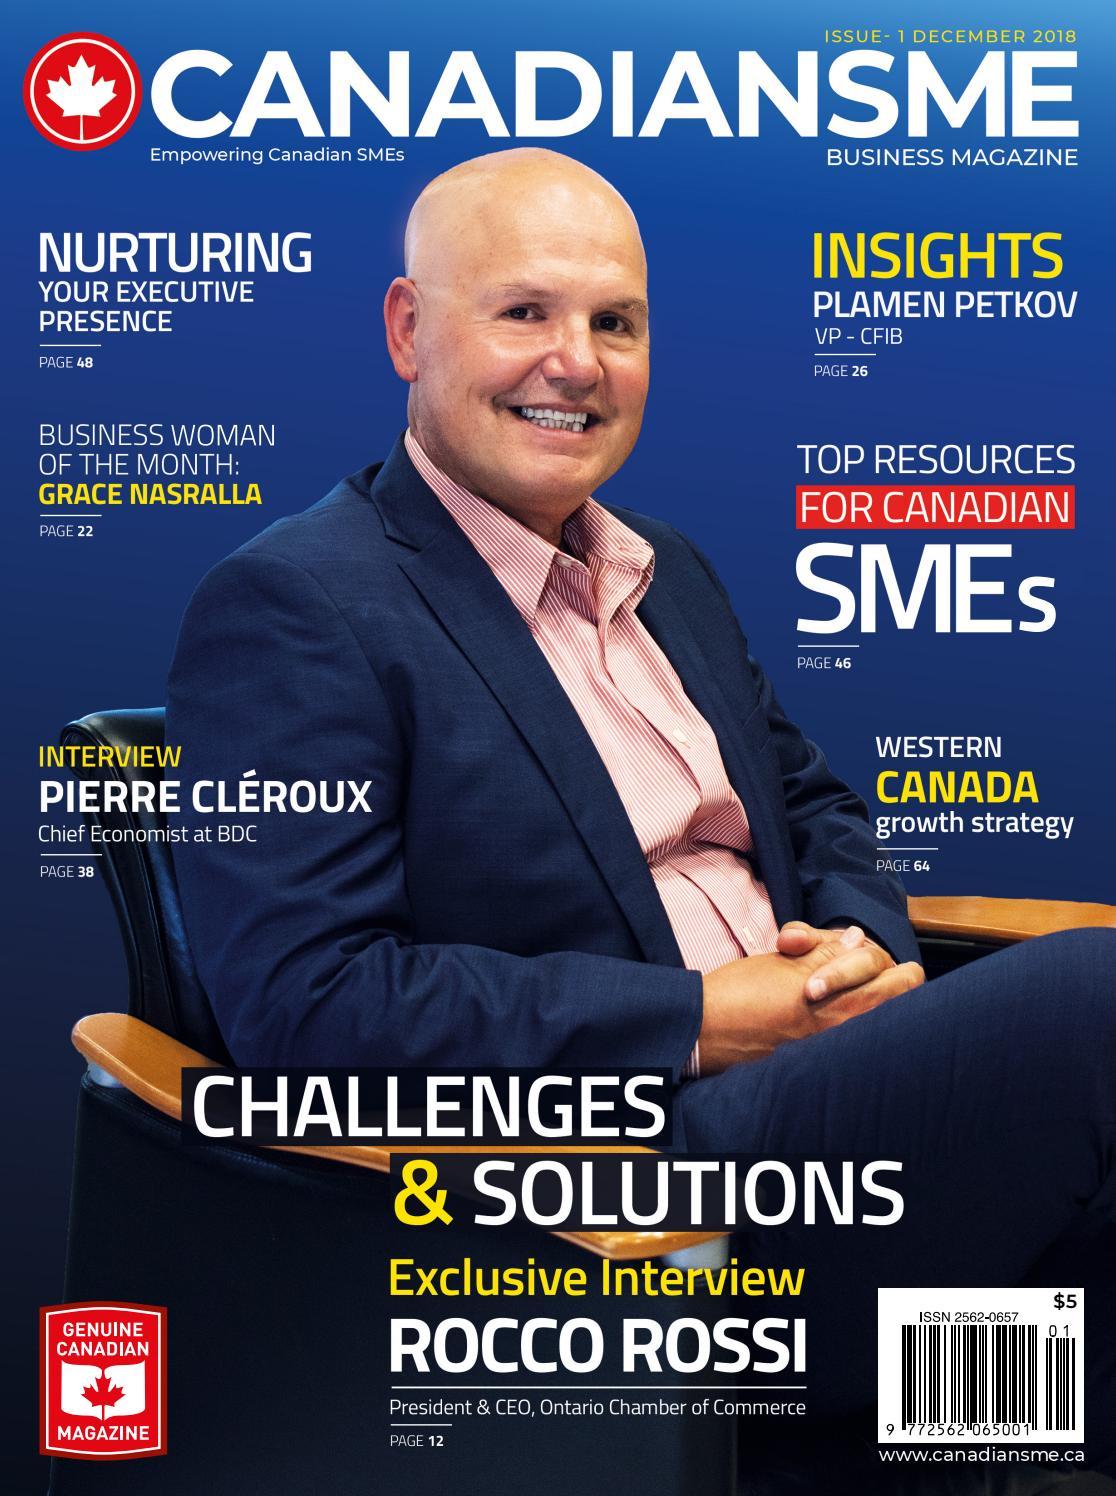 CanadianSME Business Magazine by CanadianSME - issuu